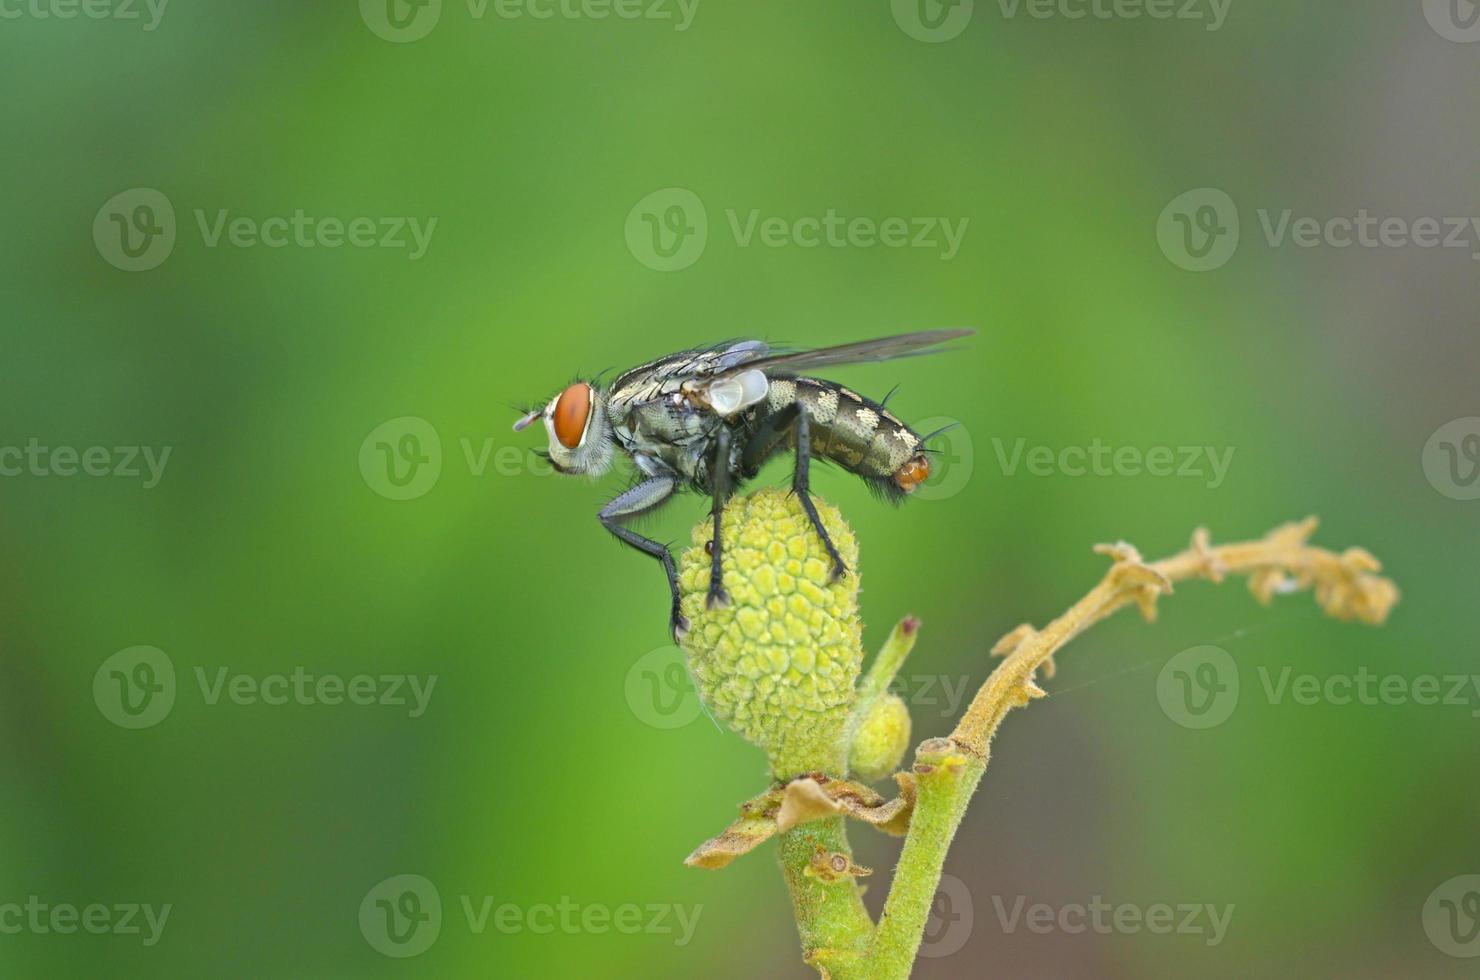 voar na fruta longan foto